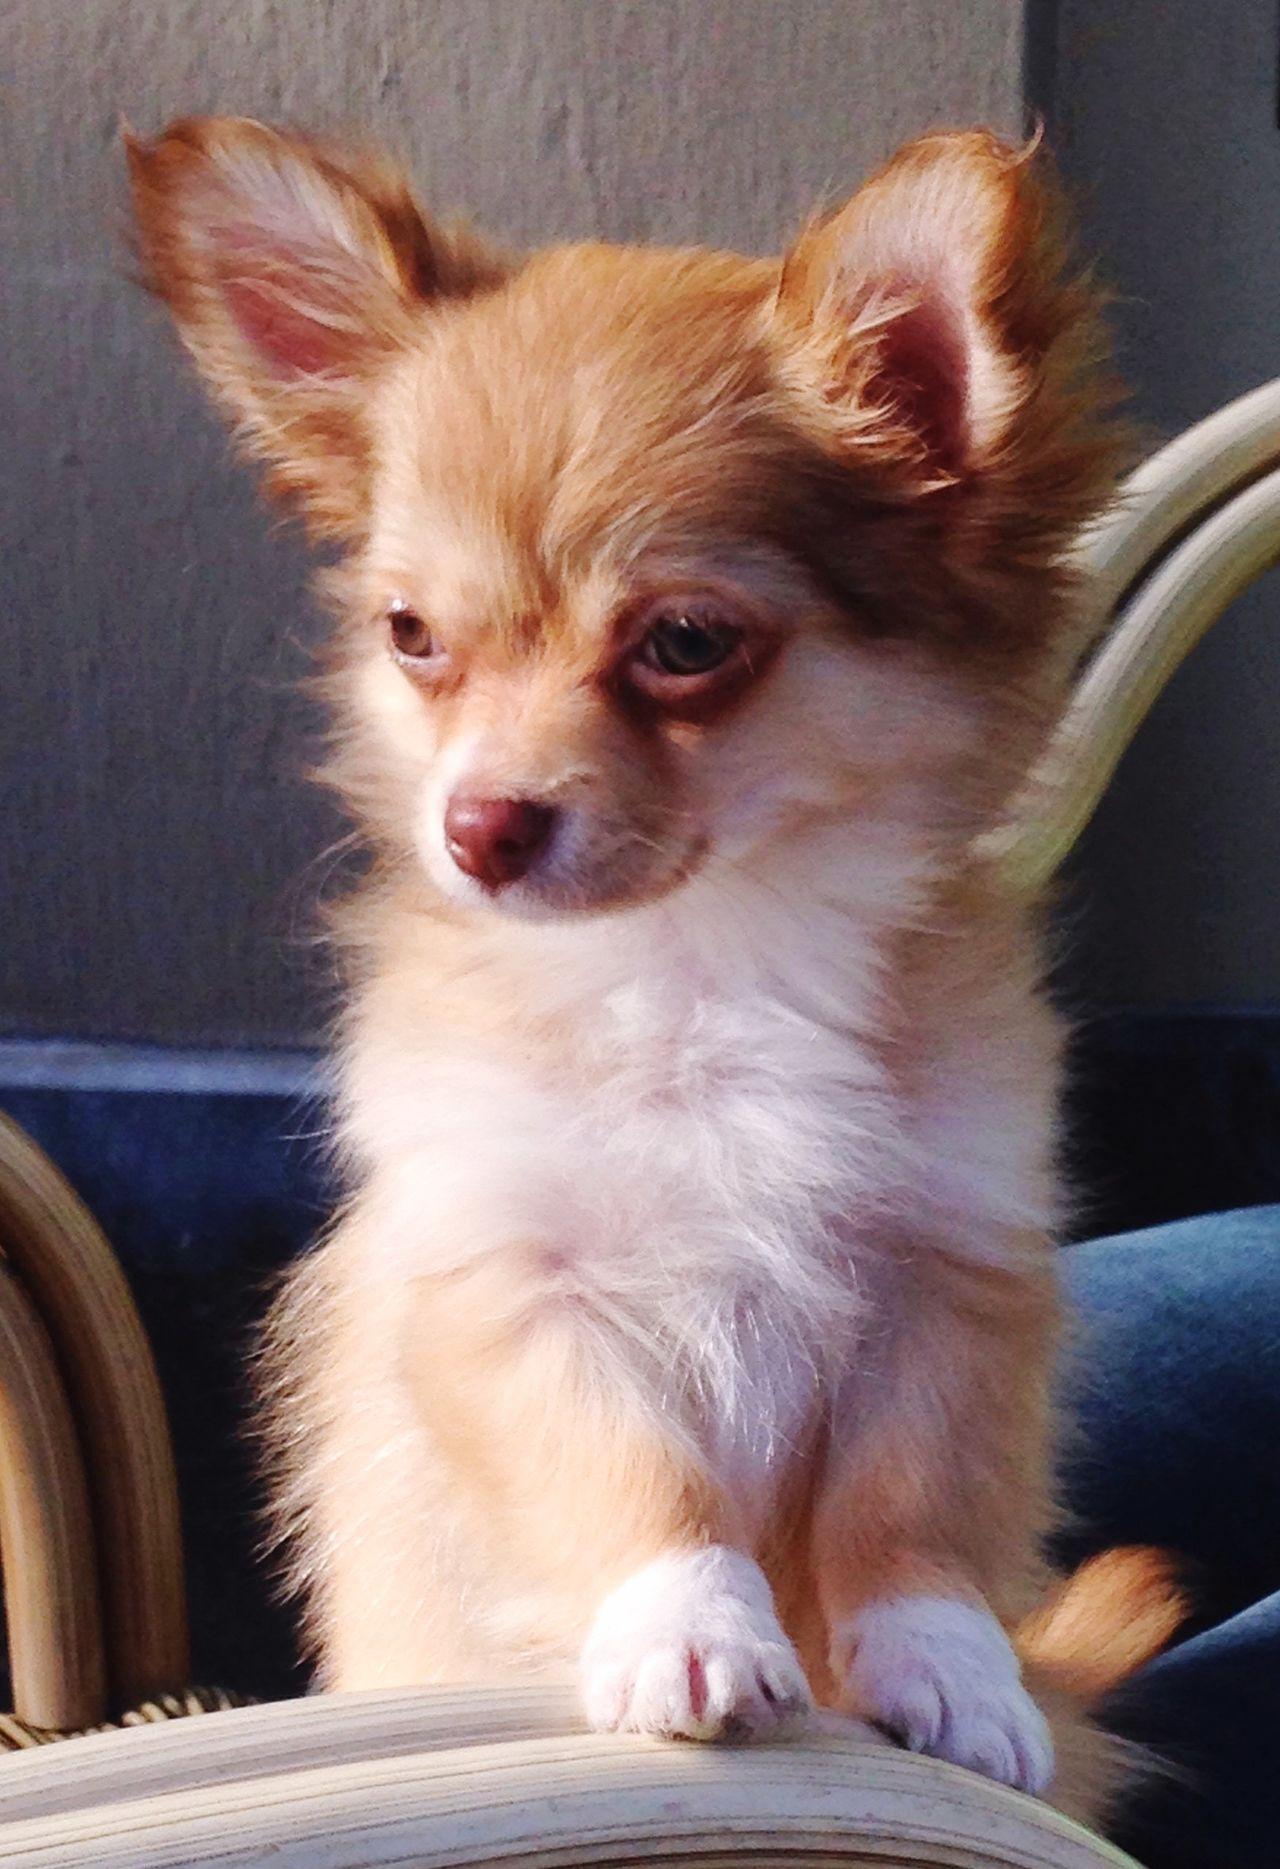 Gorki .... Pets Corner Dogs Doglover Puppies Pets Pups Puppy Love Animals Puppy❤ Puppyeyes Dogslife Hi! Chiuahua Puppy Chiuaua PuppyLove Puppy Love ❤ Puppy Face Puppy Eyes